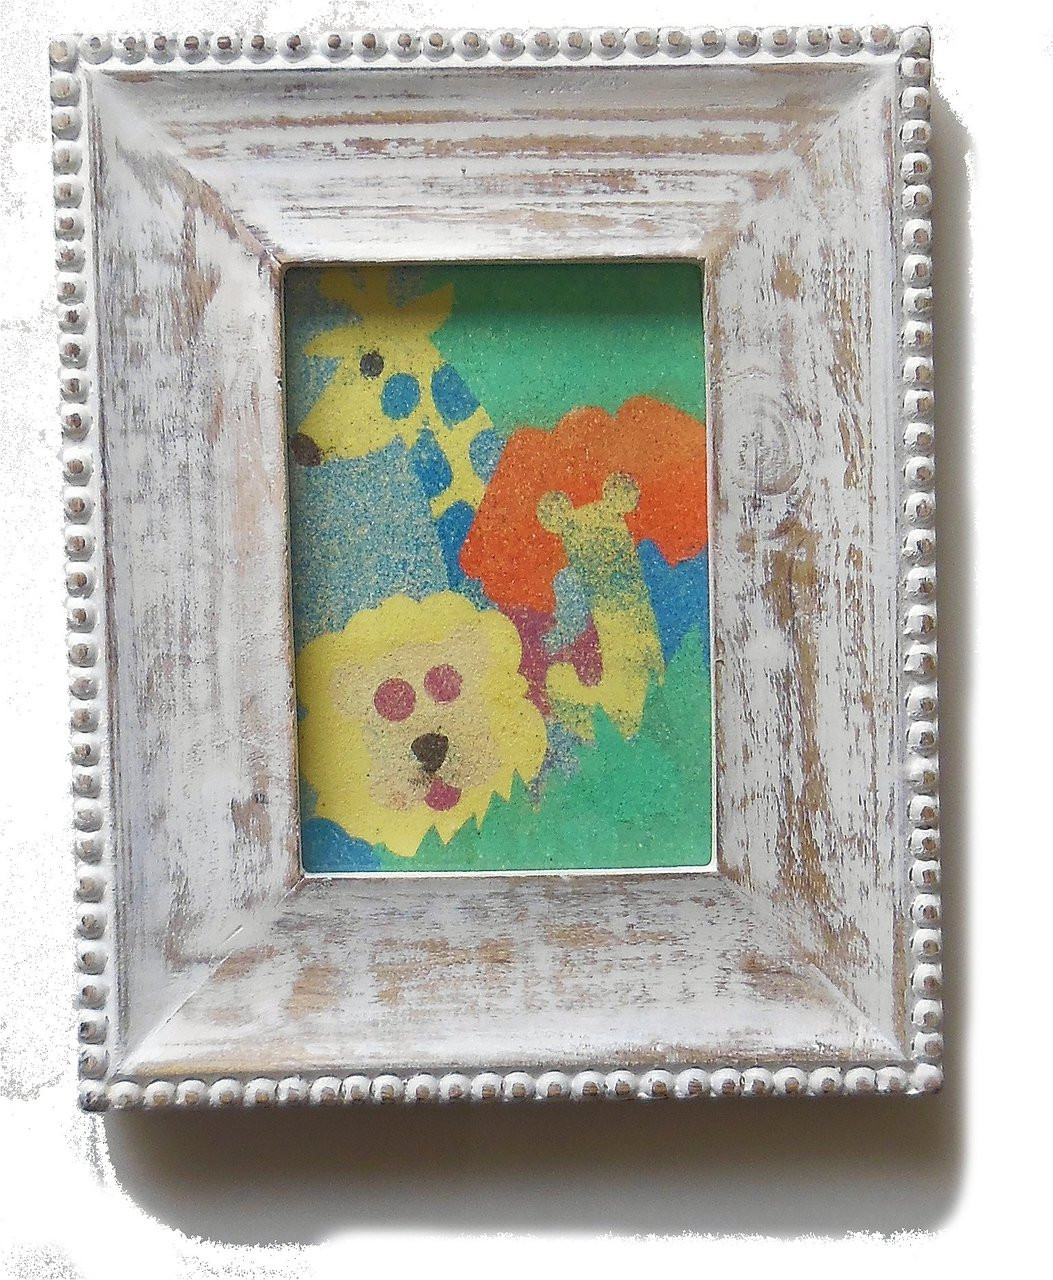 Children's colorful wild animals, sand art framed in wood.